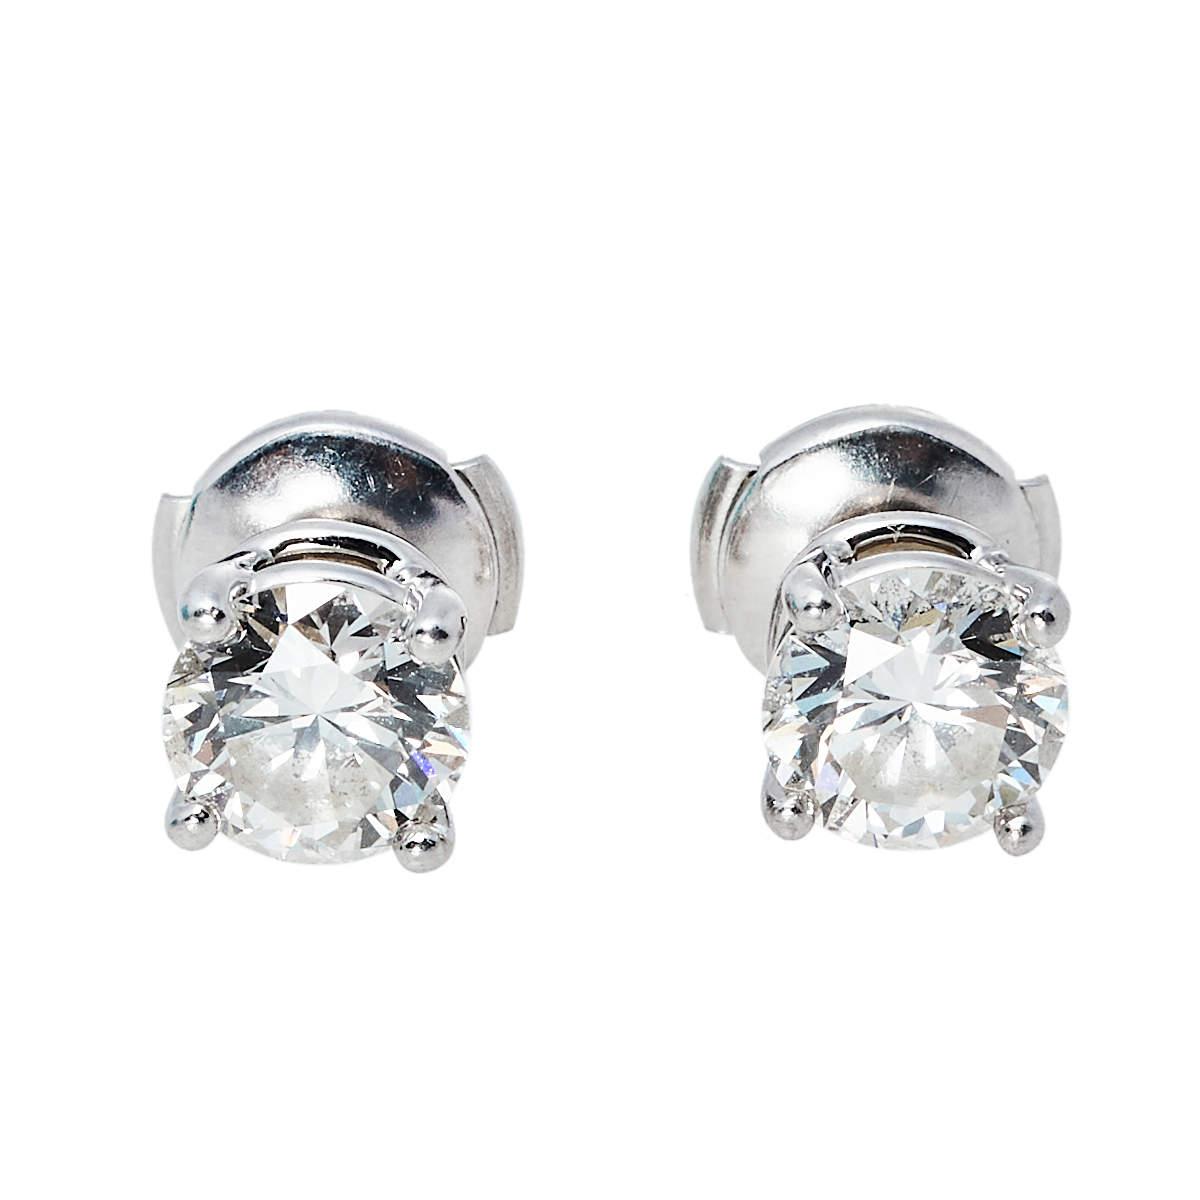 Tiffany & Co. Solitaire 2.04 ct Diamond Platinum Stud Earrings